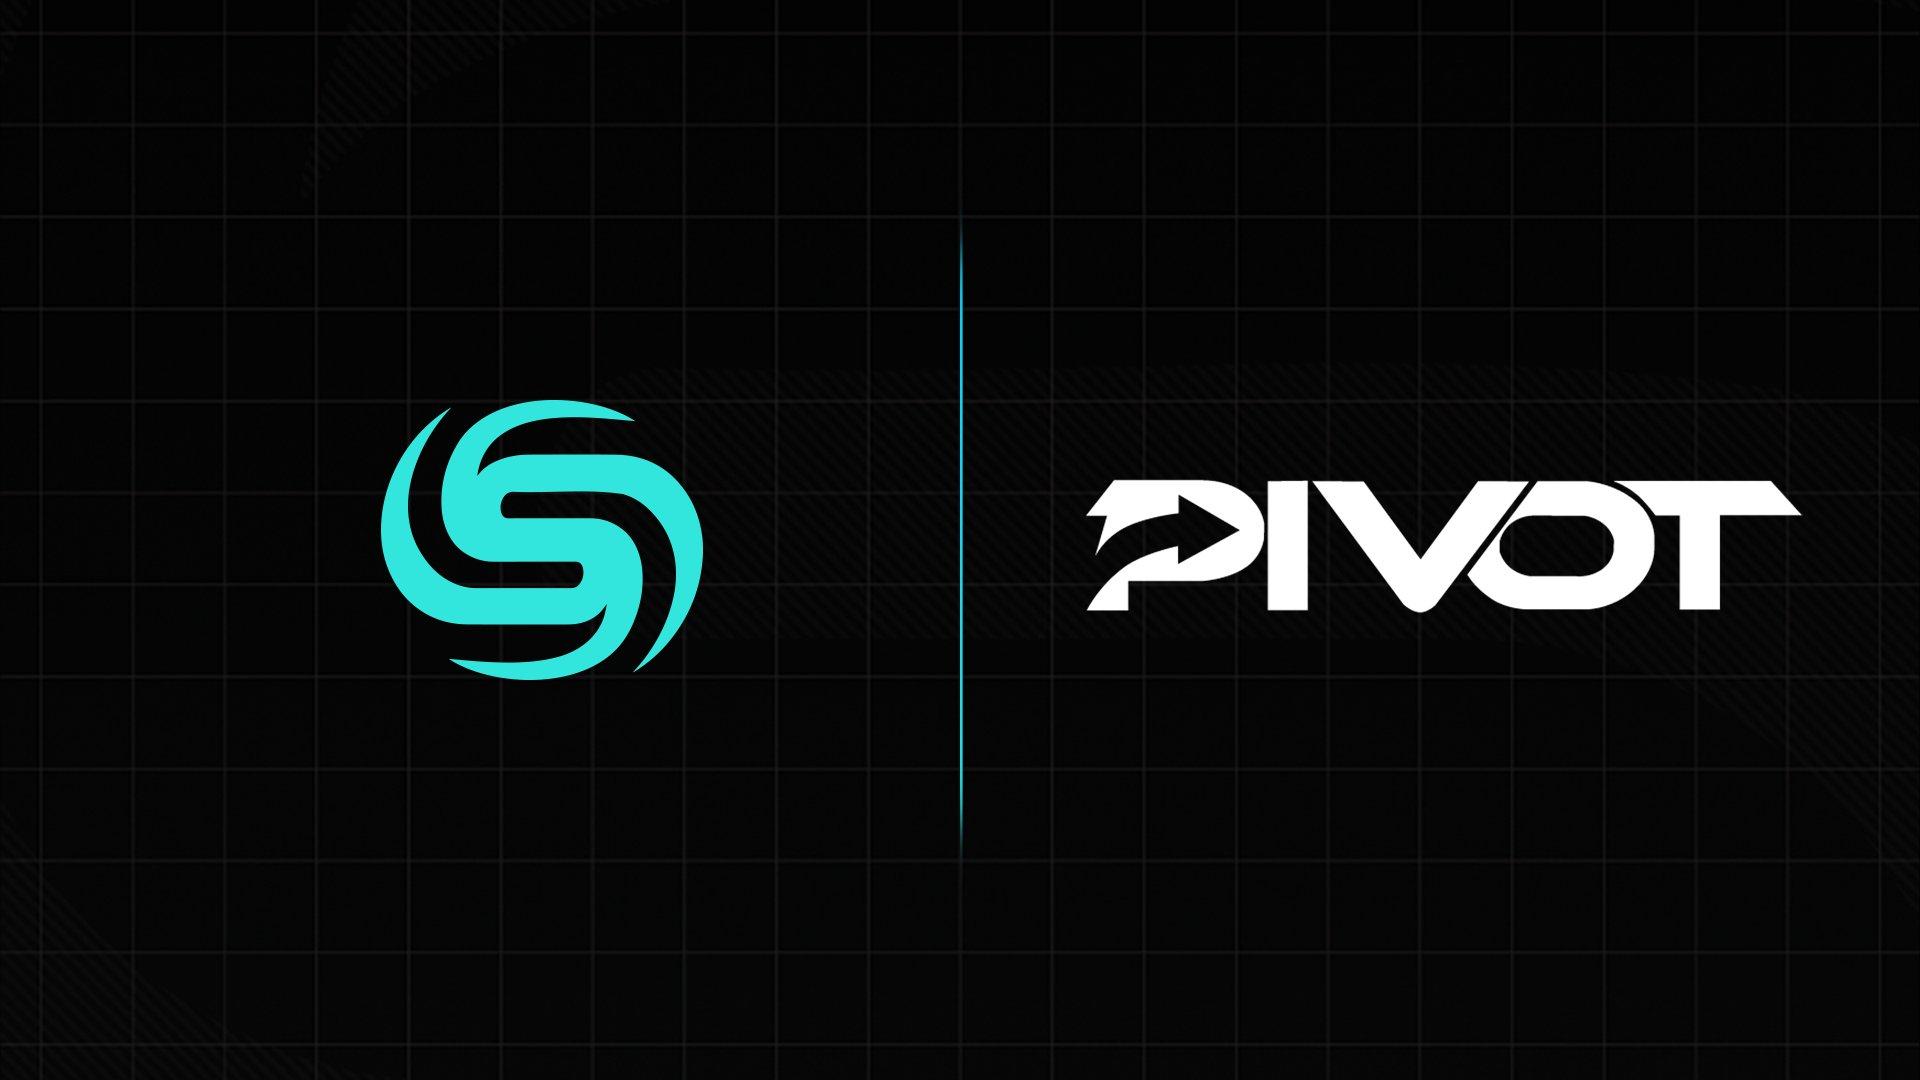 Soniqs unveils partnership with PIVOT Agency – Esports Insider